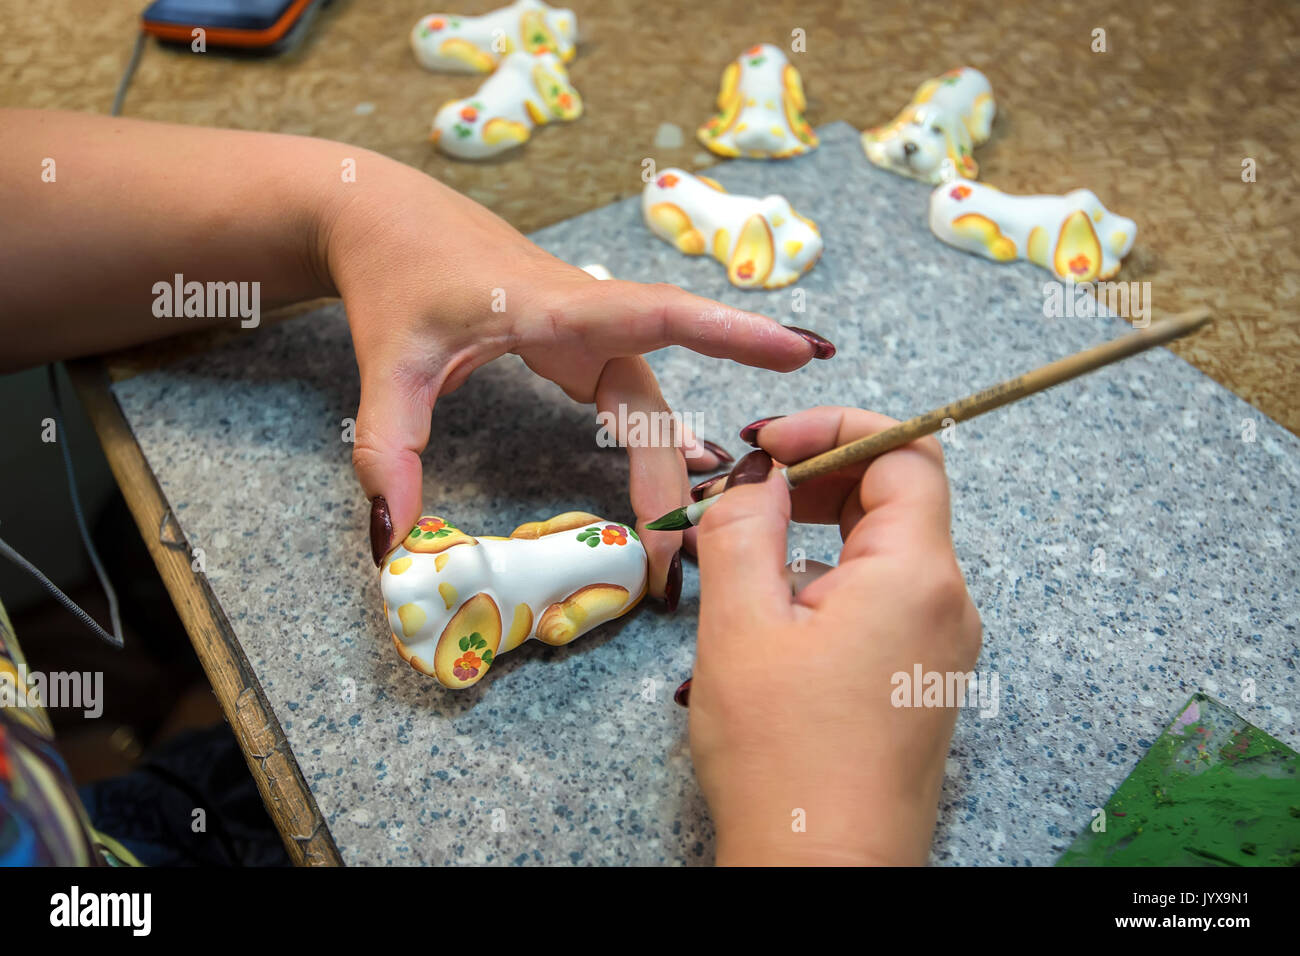 Woman hands paint earthenware figure - Stock Image